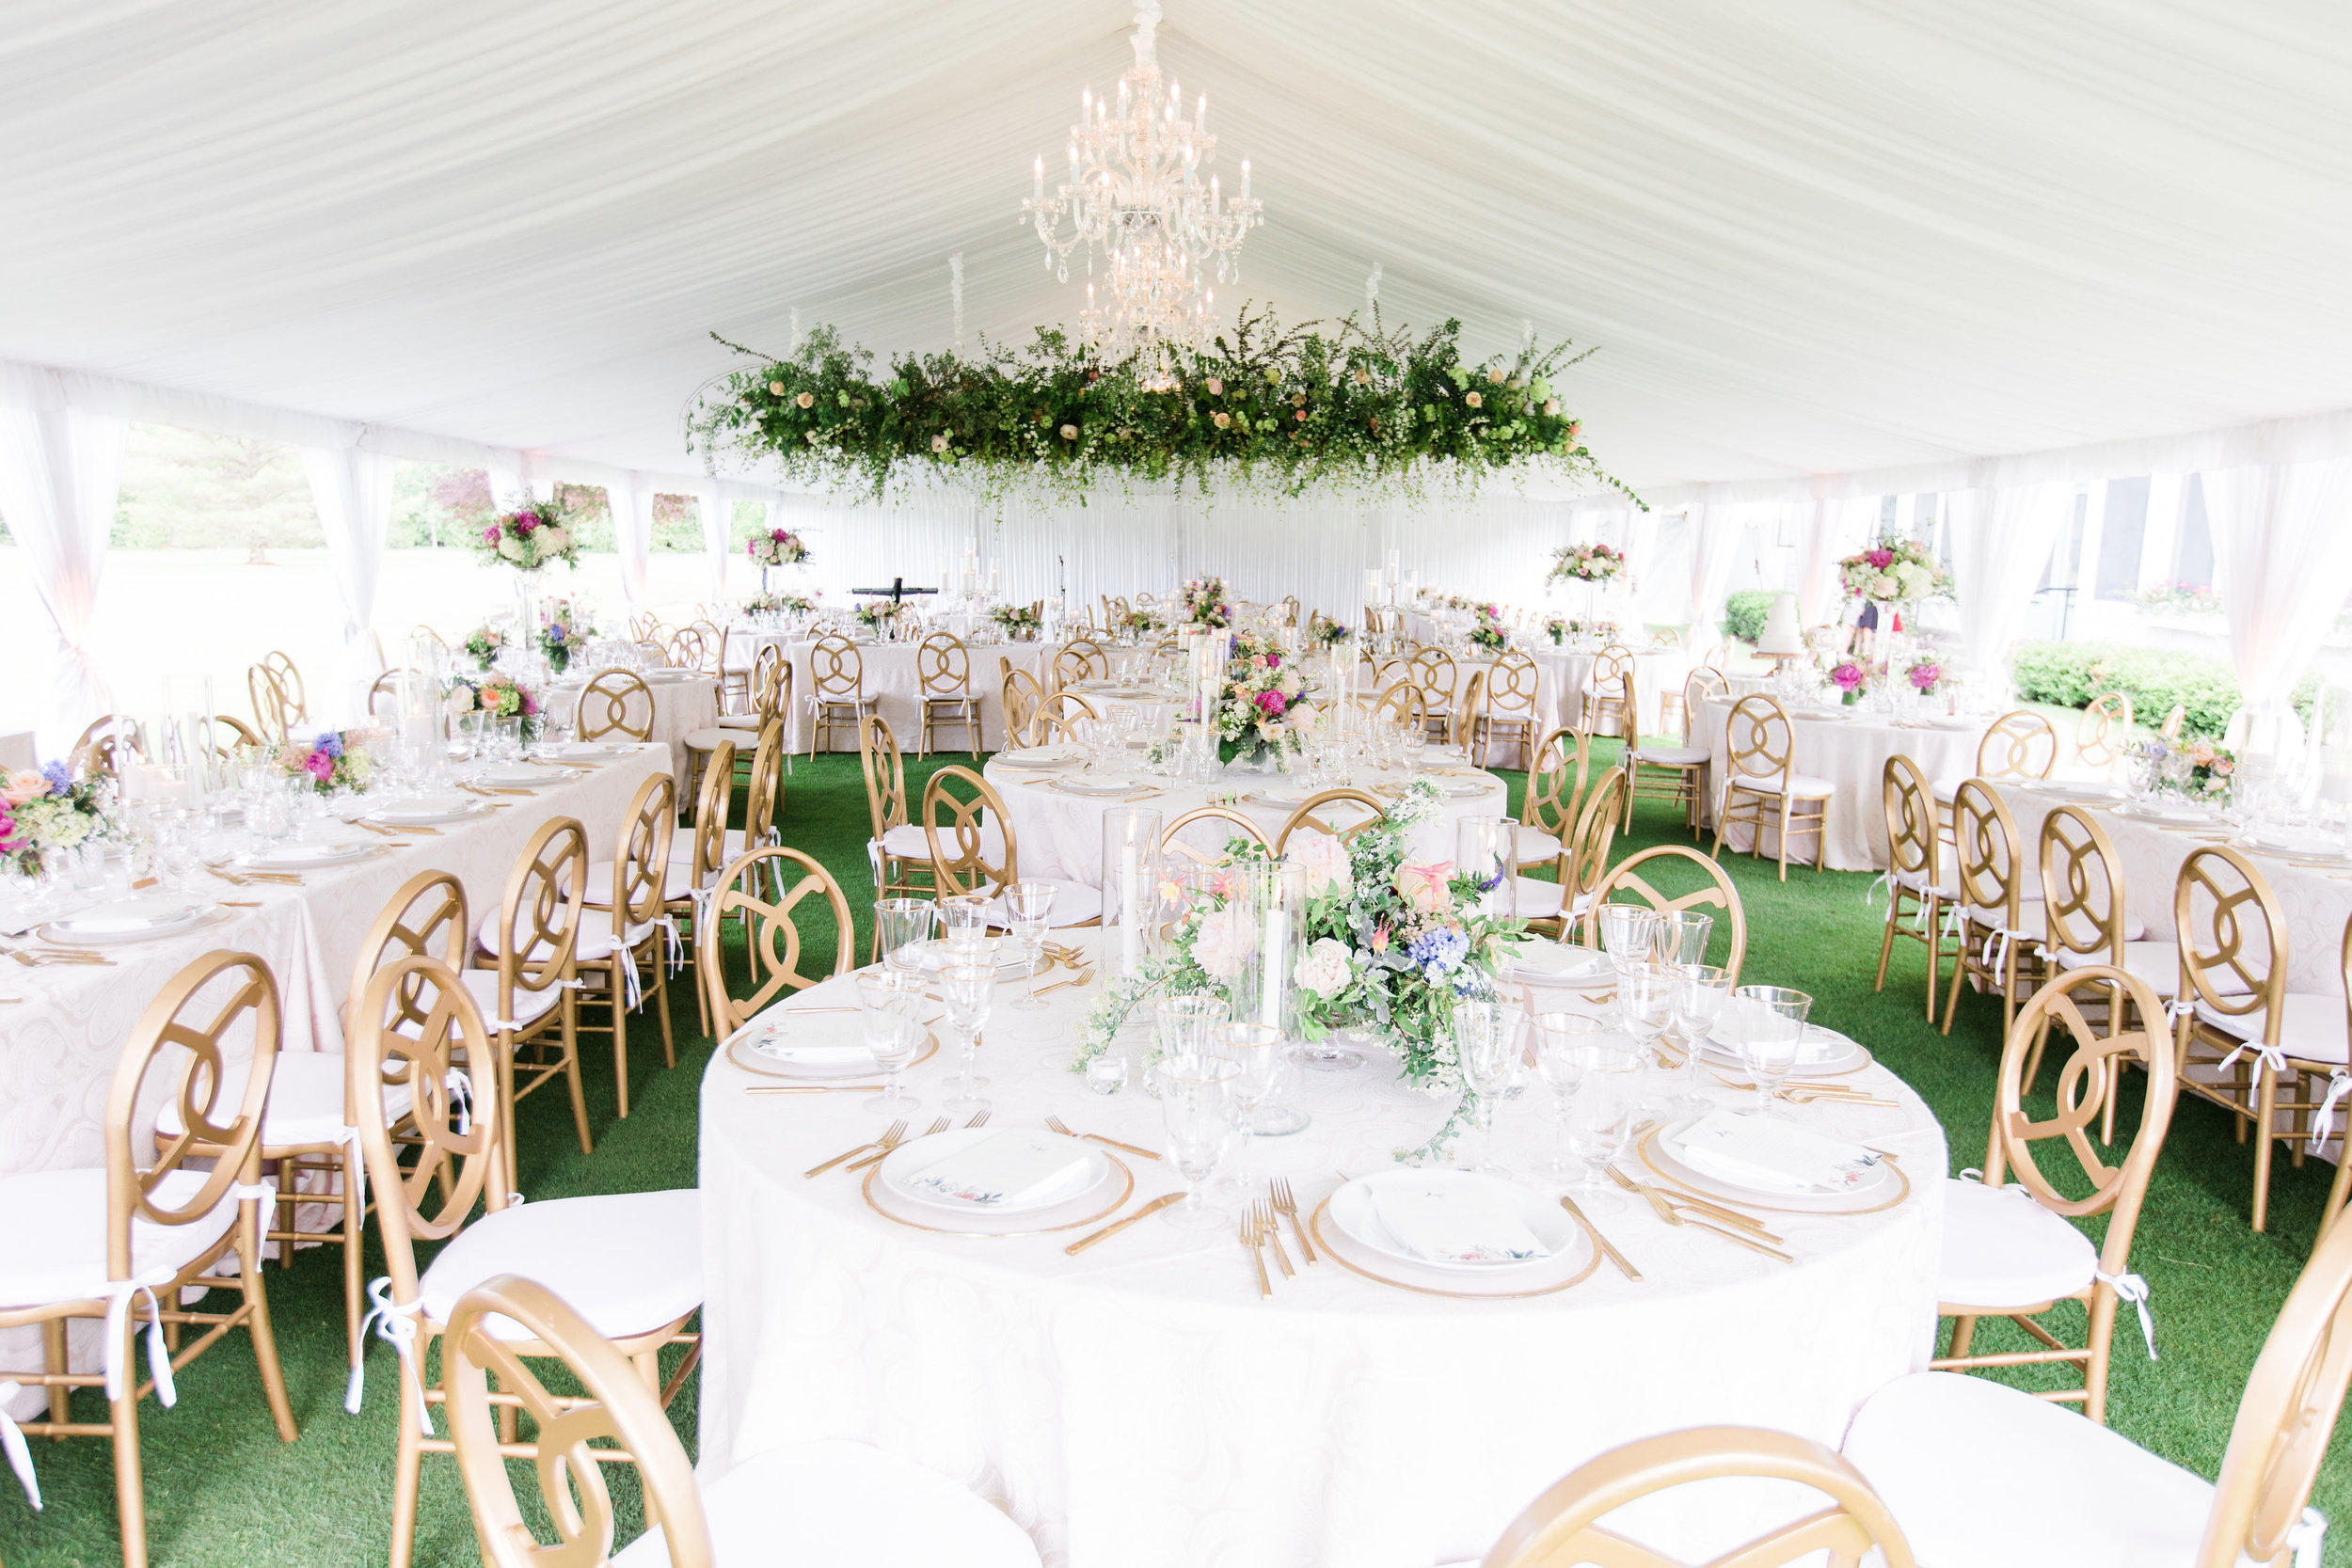 Coffman+Wedding+Reception+Details-50.jpg